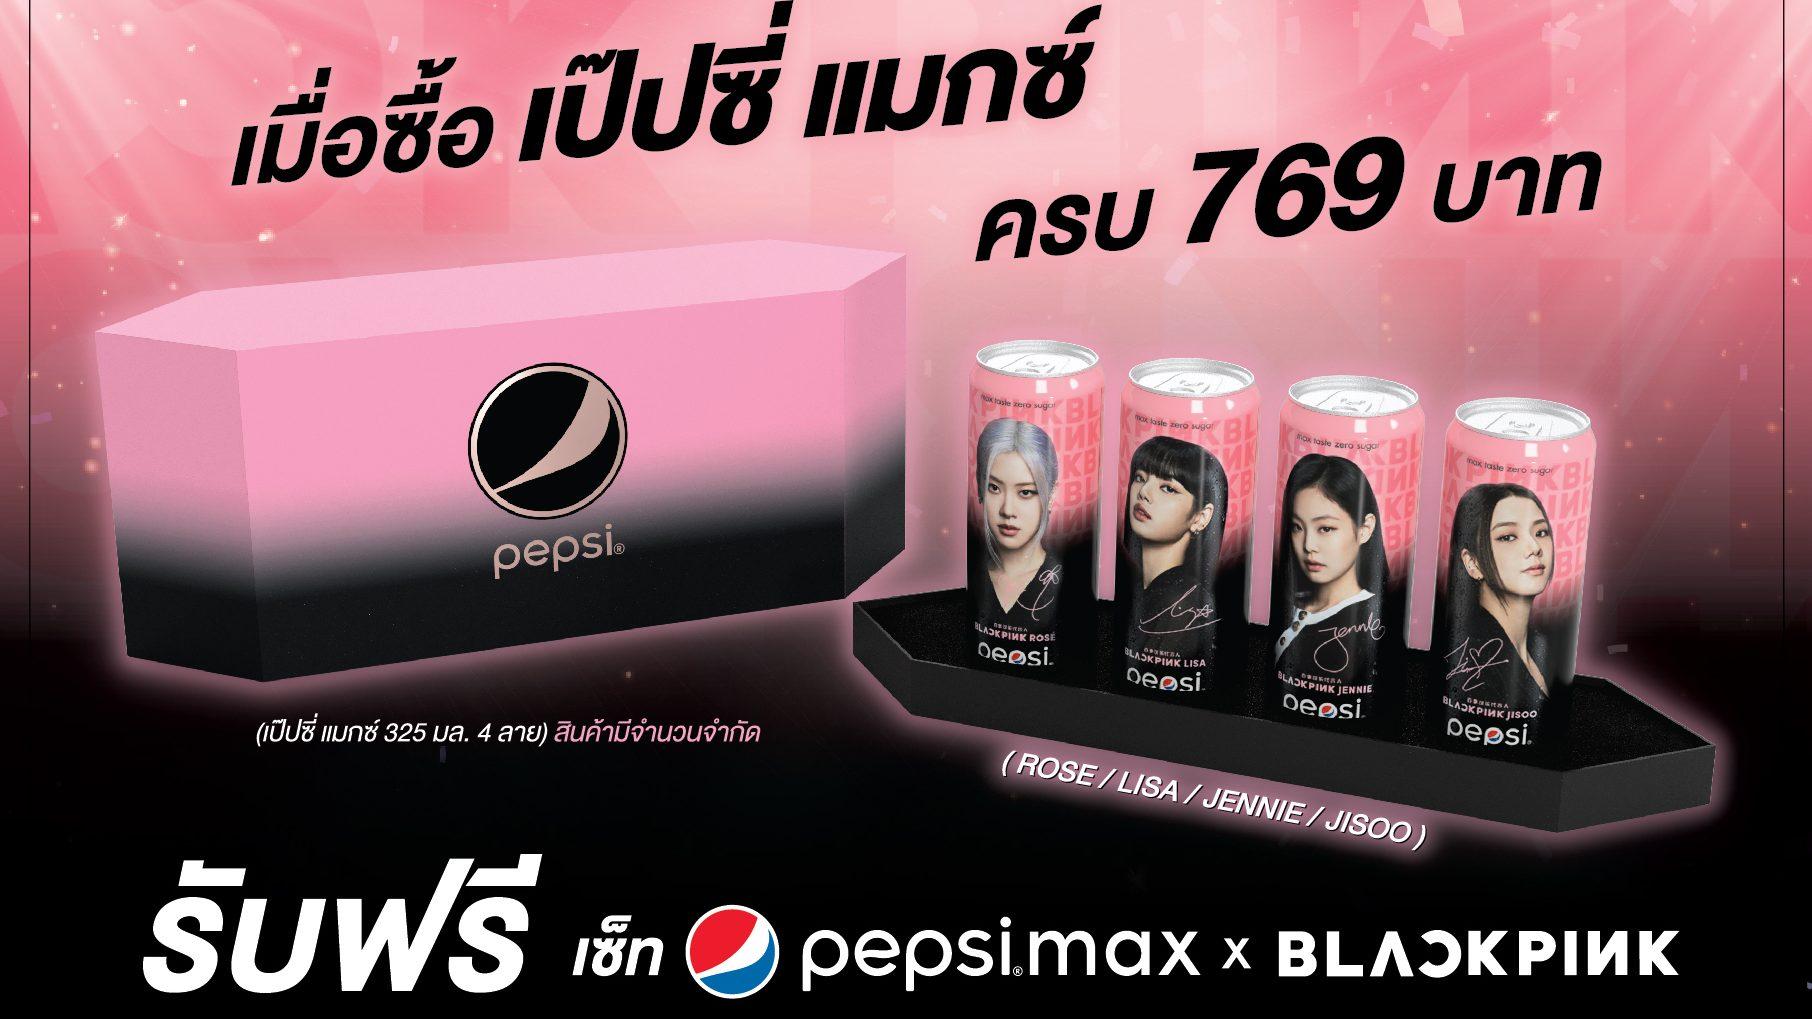 BLACKPINK Pepsi Max X BLACKPINK ซันโทรี่ เป๊ปซี่โค เบเวอเรจ เป๊ปซี่